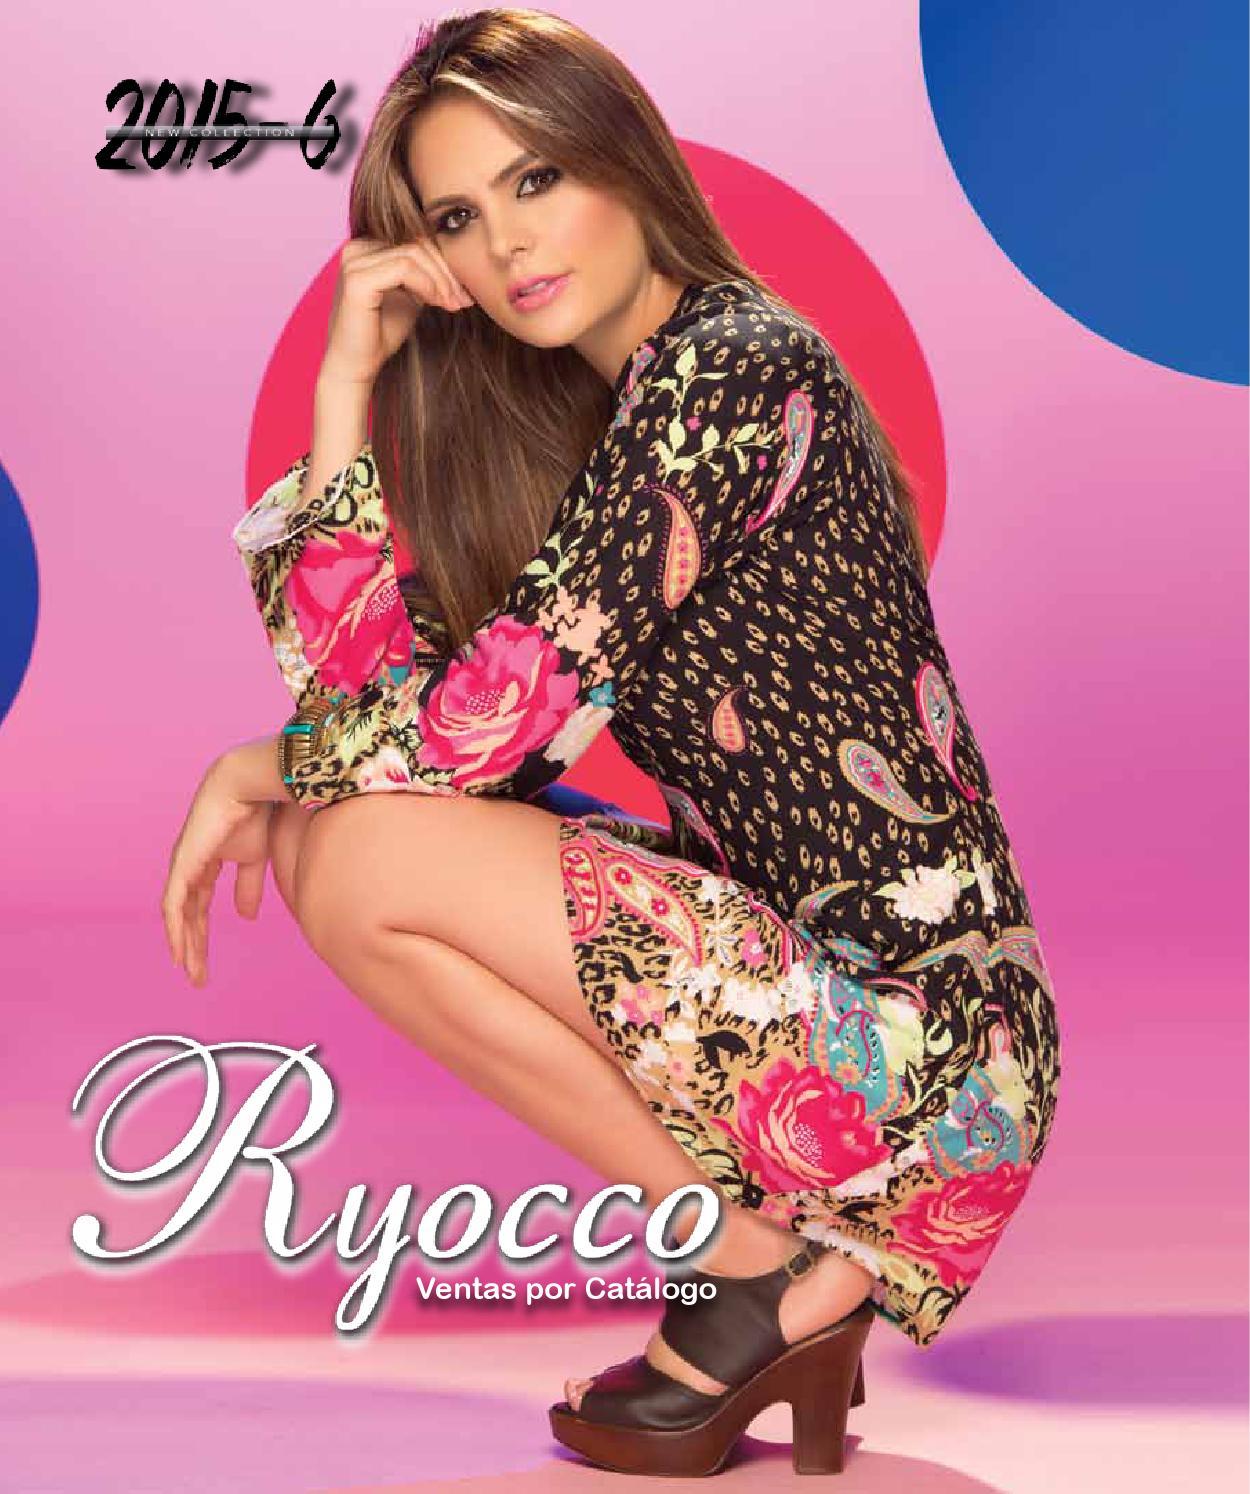 51a43d600e blusas y vestidos ryocco